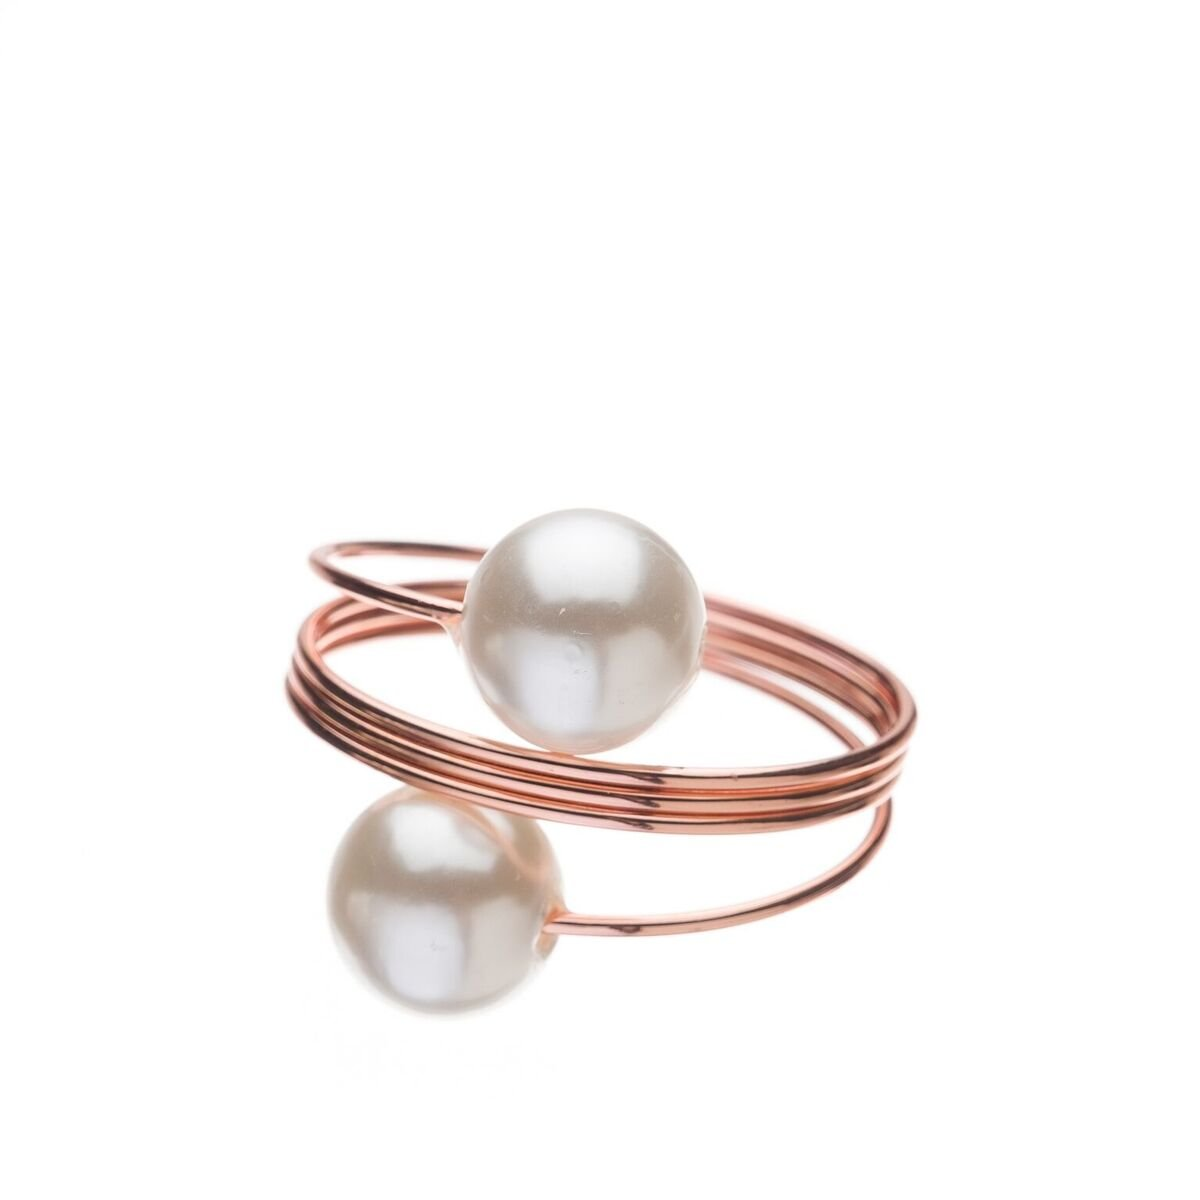 Ella Celebration Pearl Napkin Ring Holders, Bulk Napkin Rings for Weddings, Rose Gold Set of 12 Wedding Table Decorations (Rose Gold)